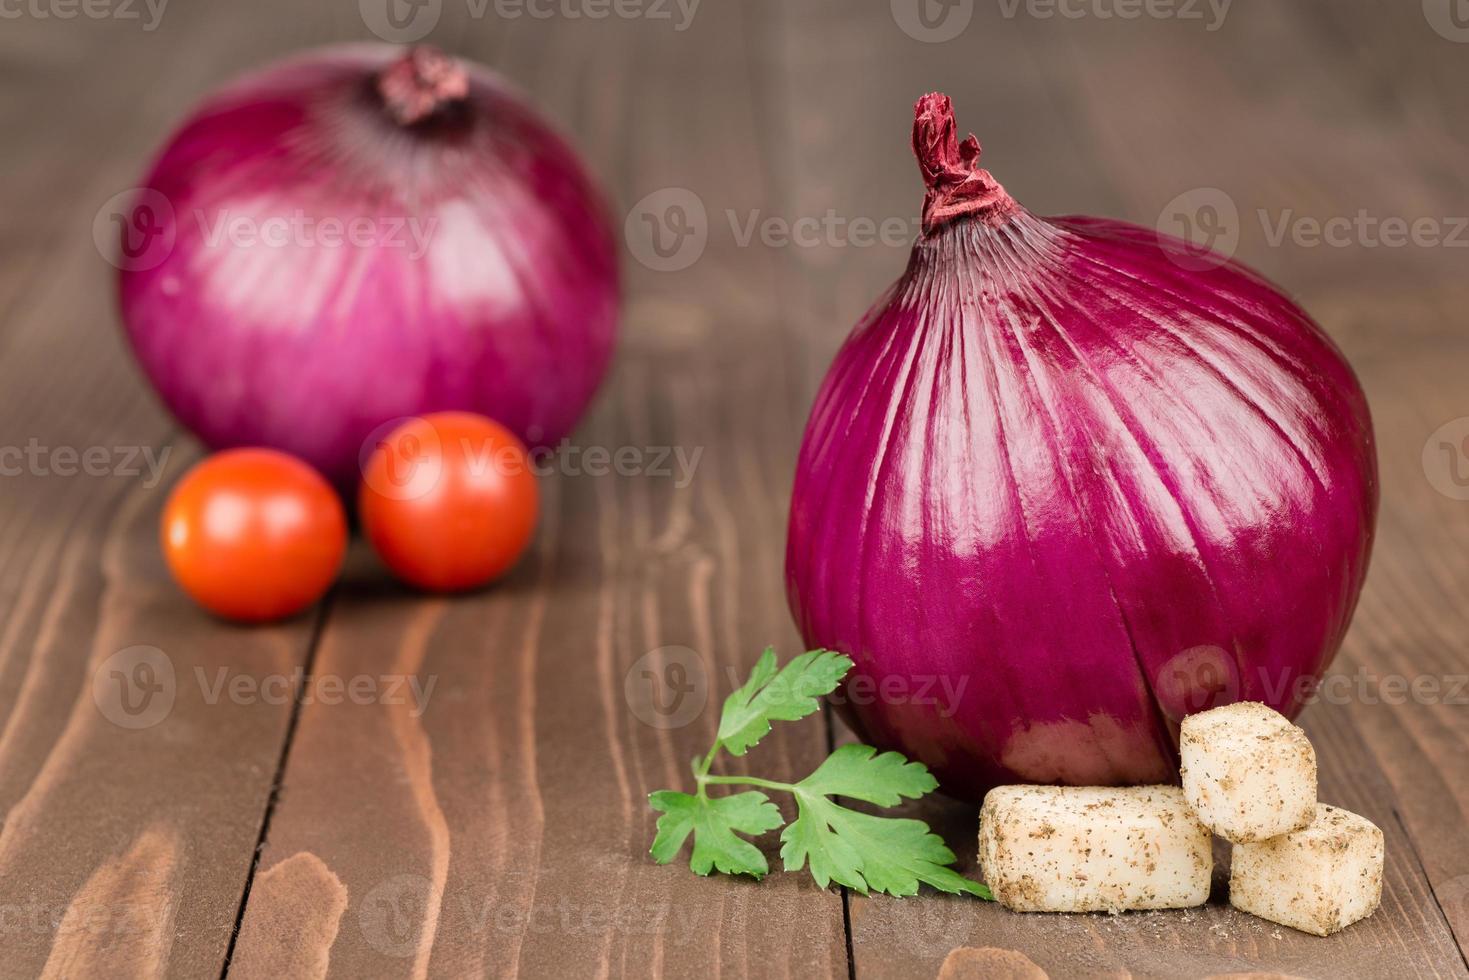 cebolla roja foto